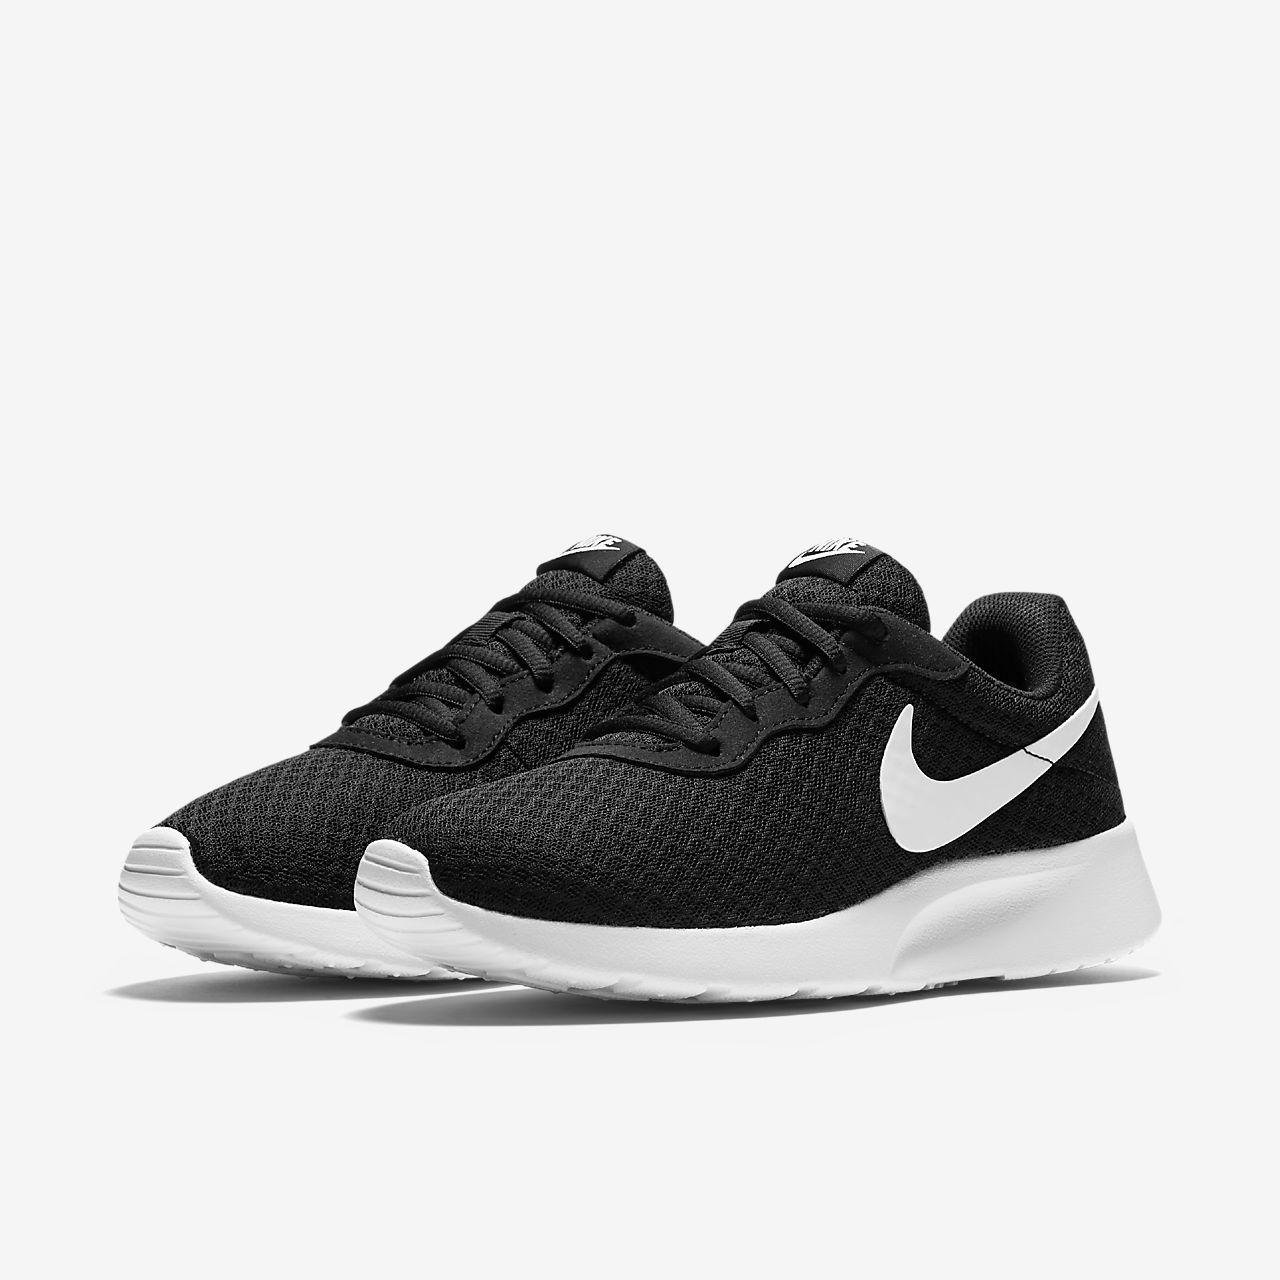 Nike Womens White Basketball Shoes